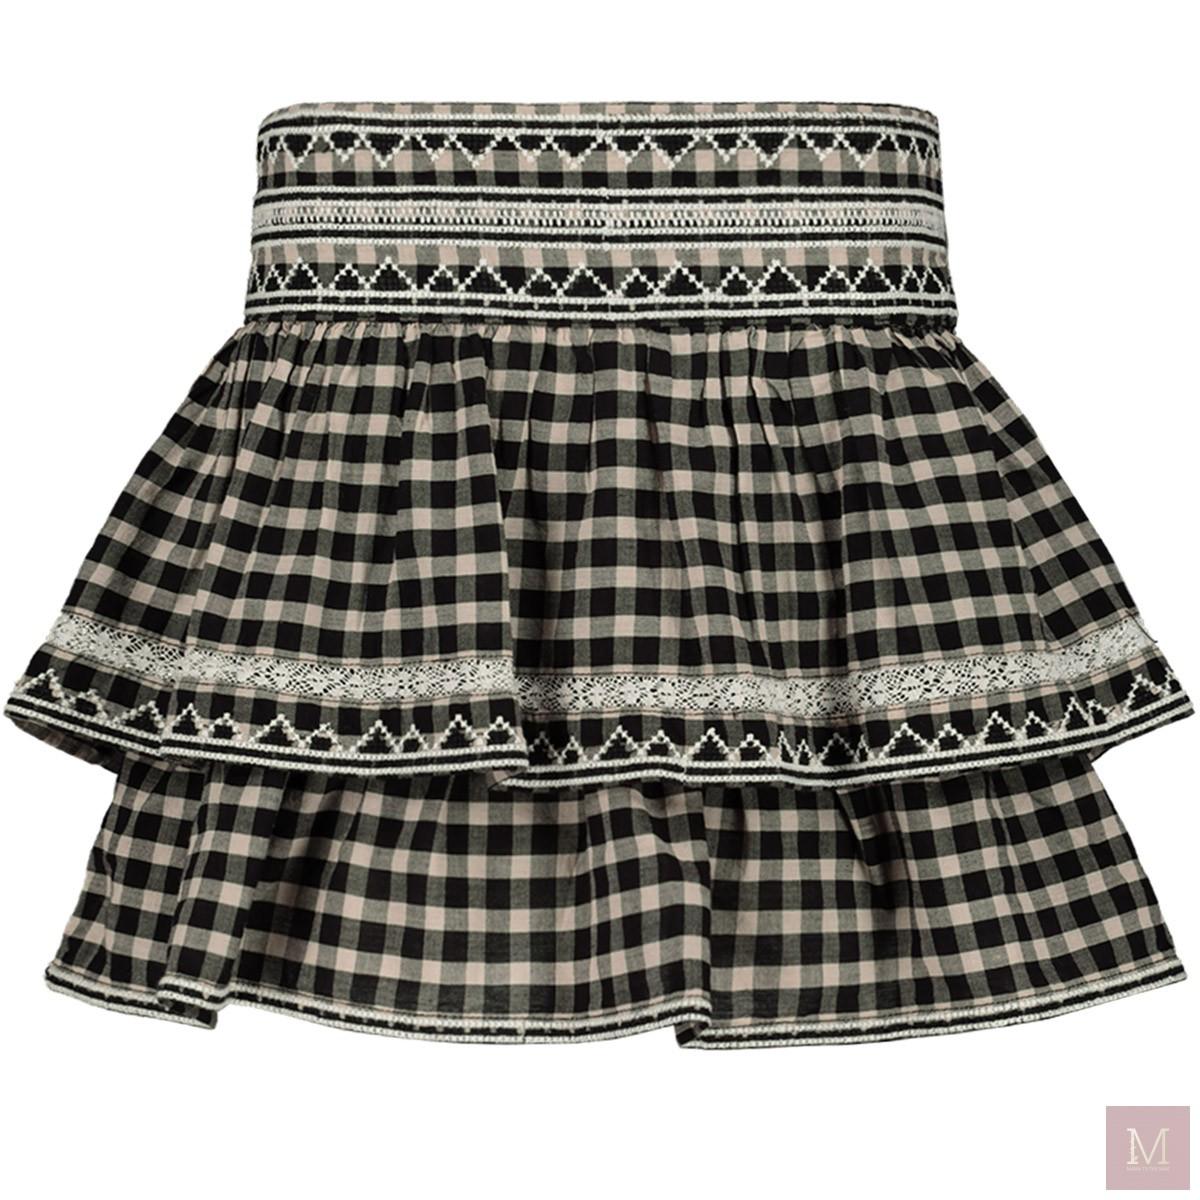 Scotch & Soda rok, favoriete kledingmerken, kleertjes.com